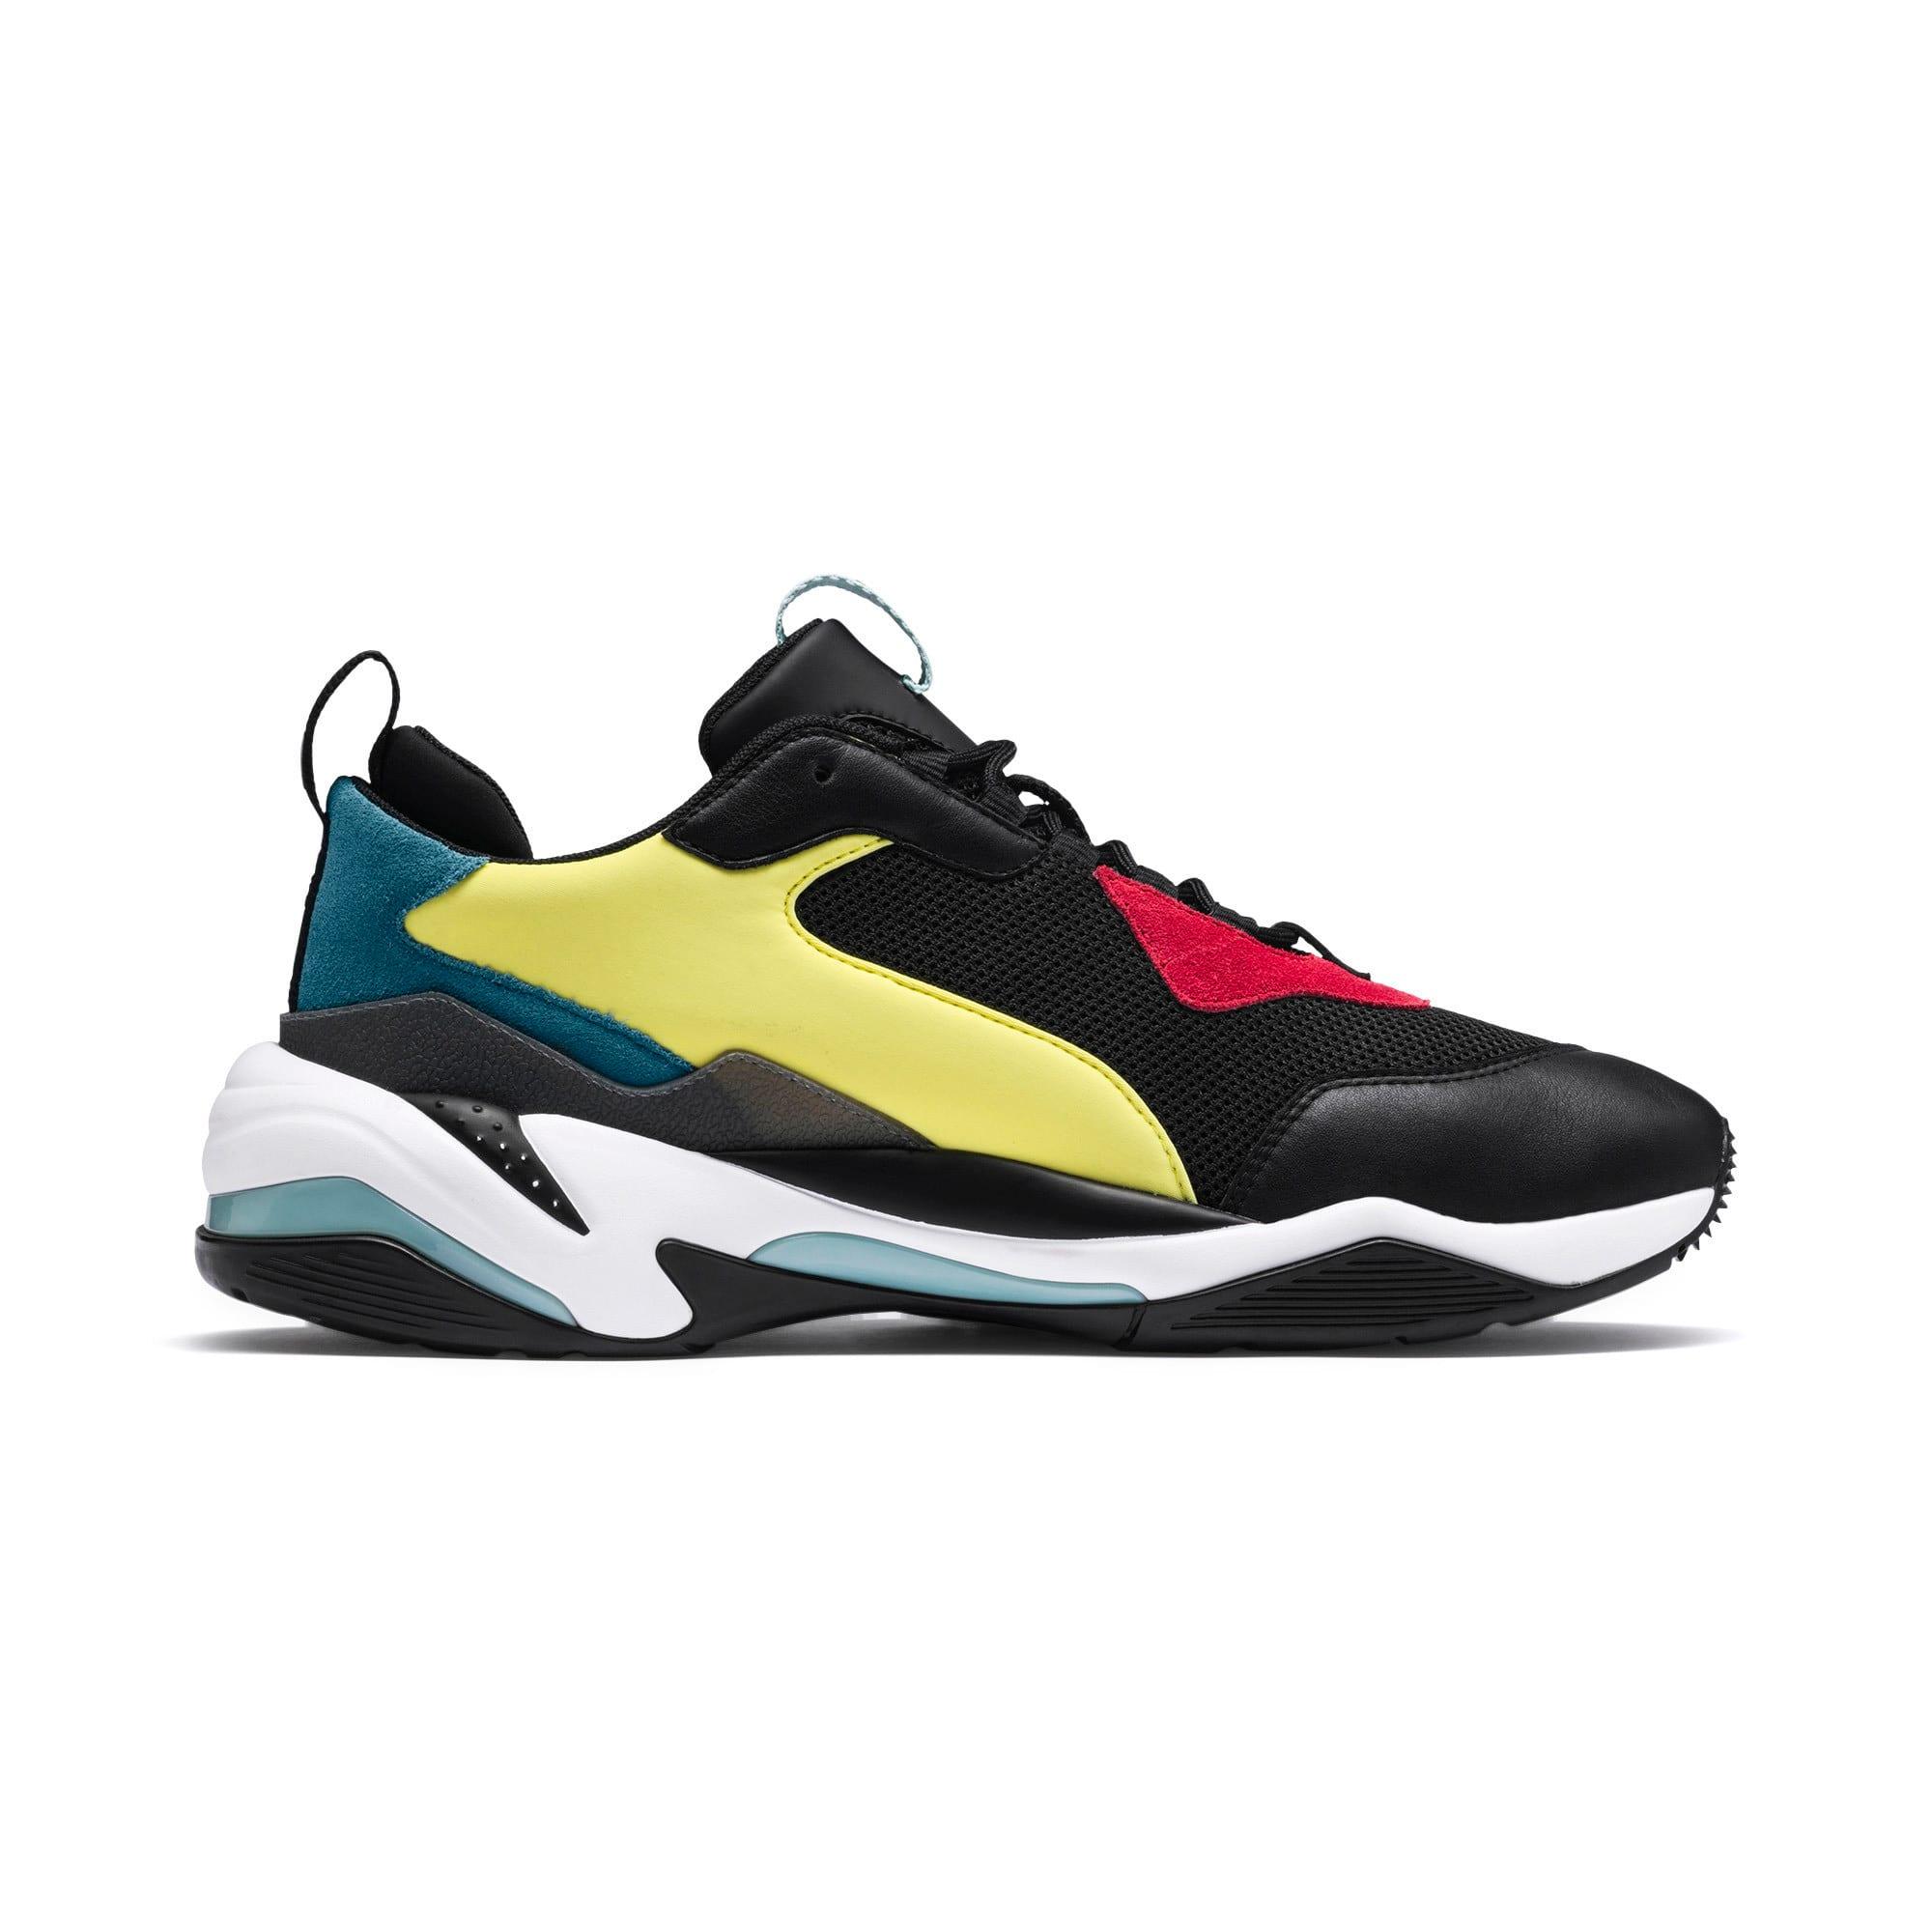 Thumbnail 5 of Thunder Spectra Sneakers, Puma Blk-Puma Blk-Puma White, medium